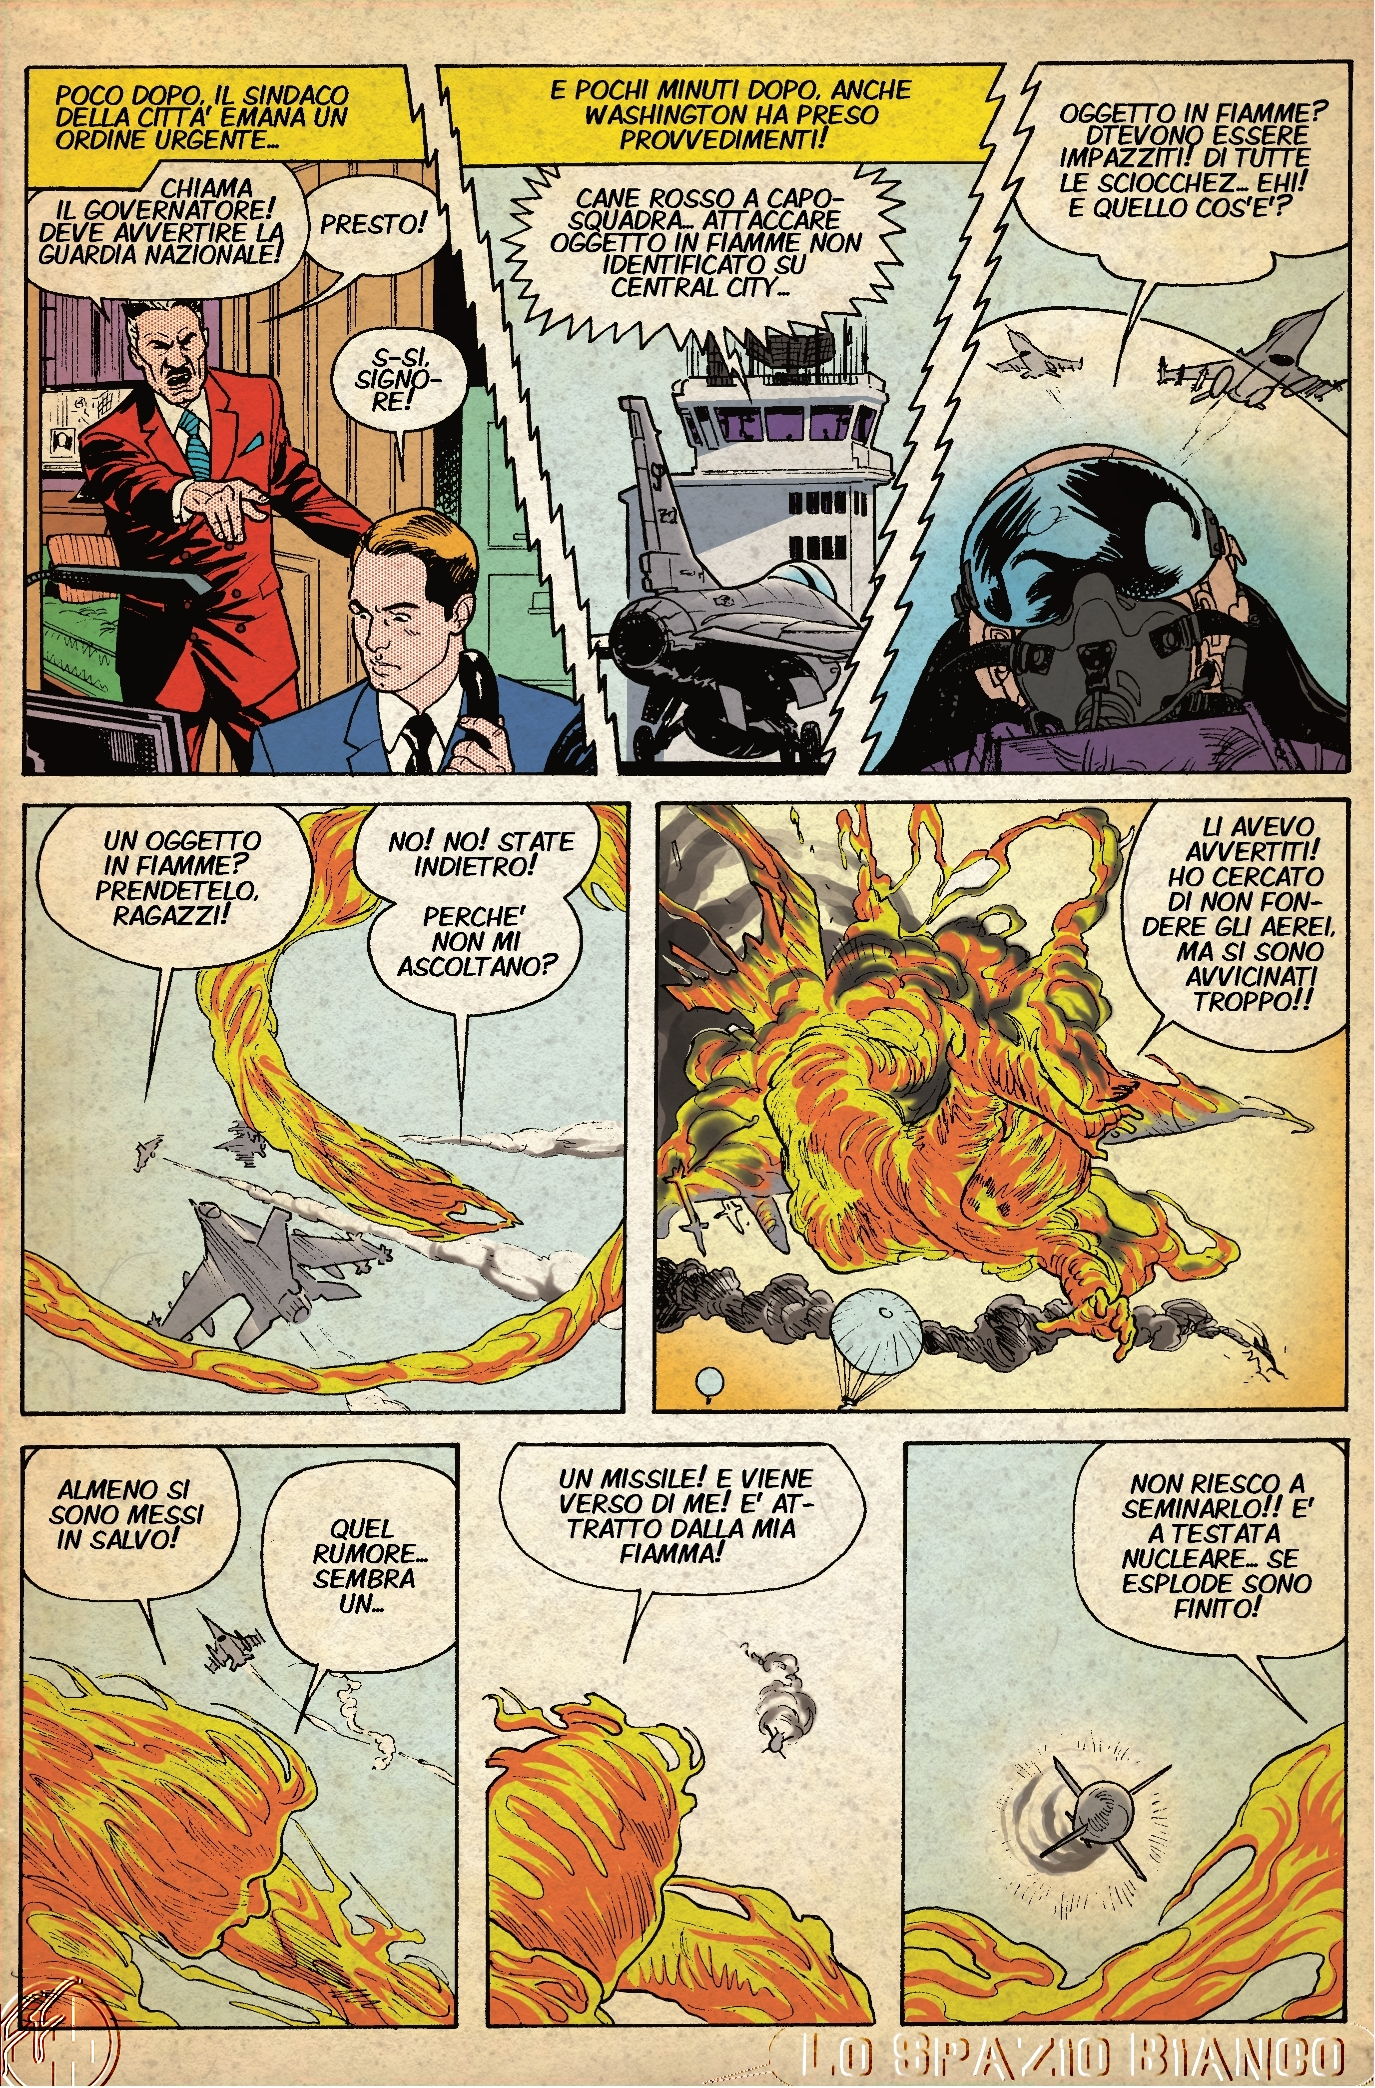 Fantastici Quattro n.1 Pagina 7 (Federico Nardo)